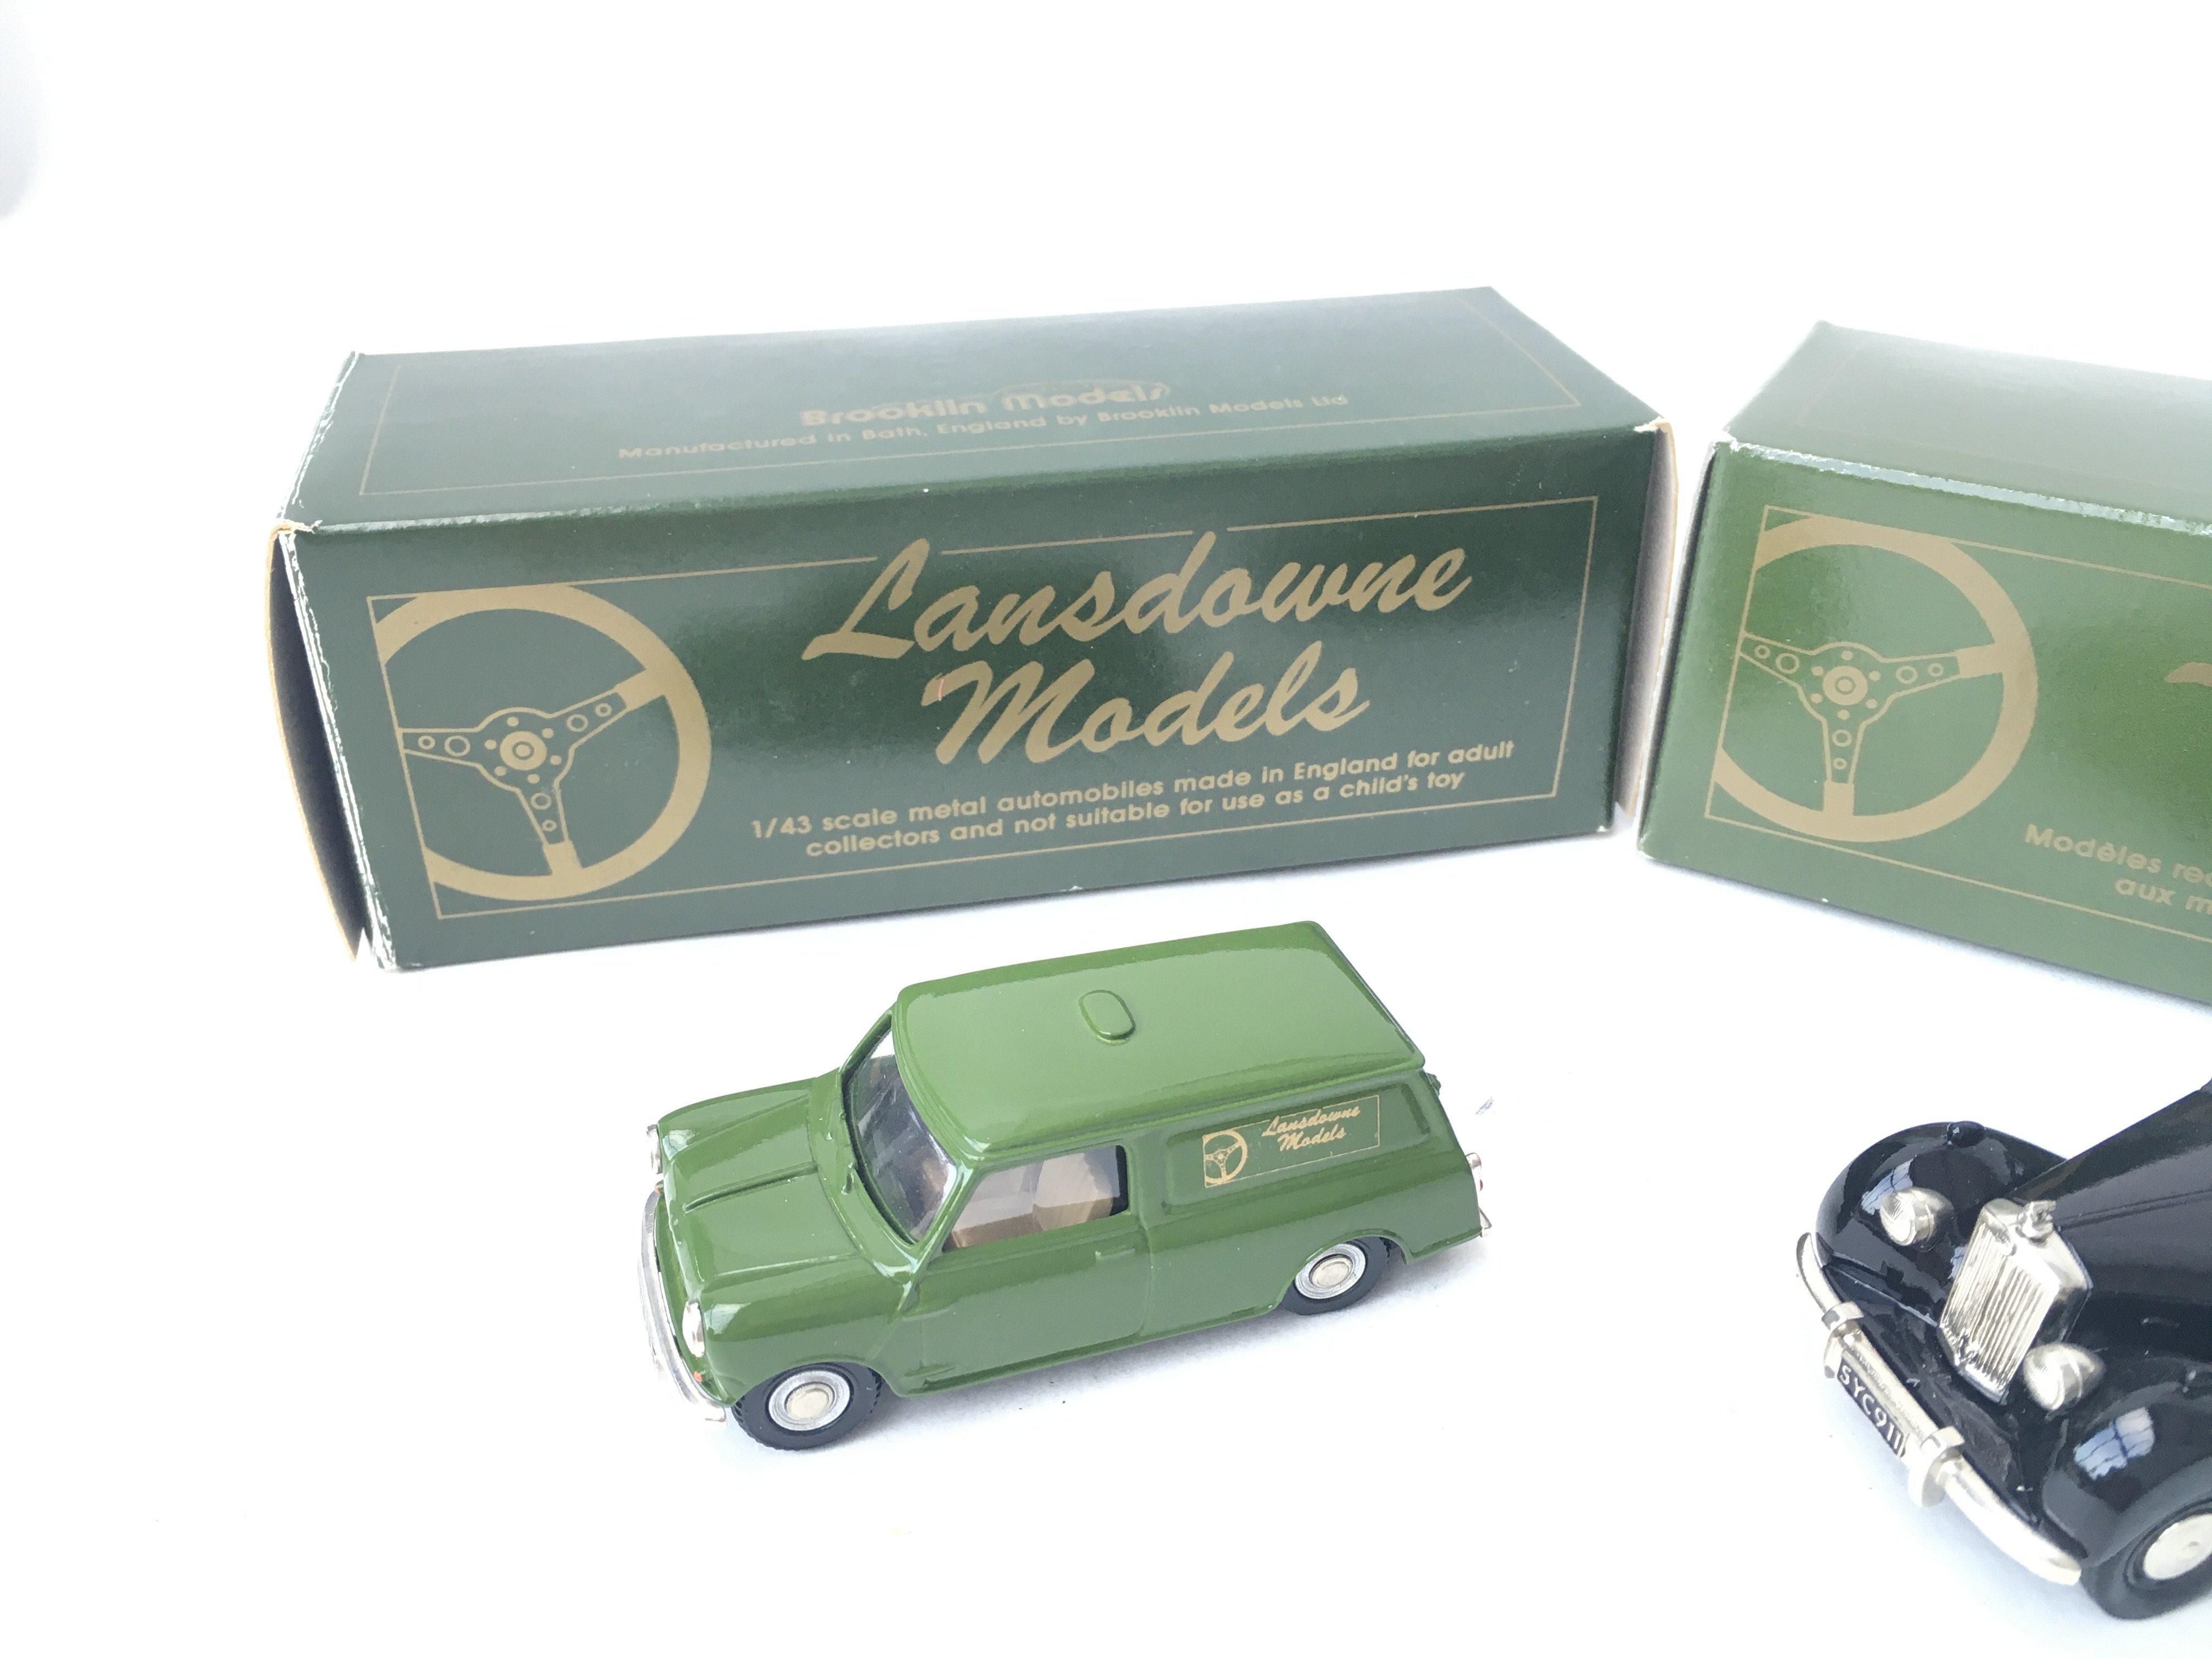 2 X Lansdowne Models including LD4 1962 Morris Min - Image 2 of 3